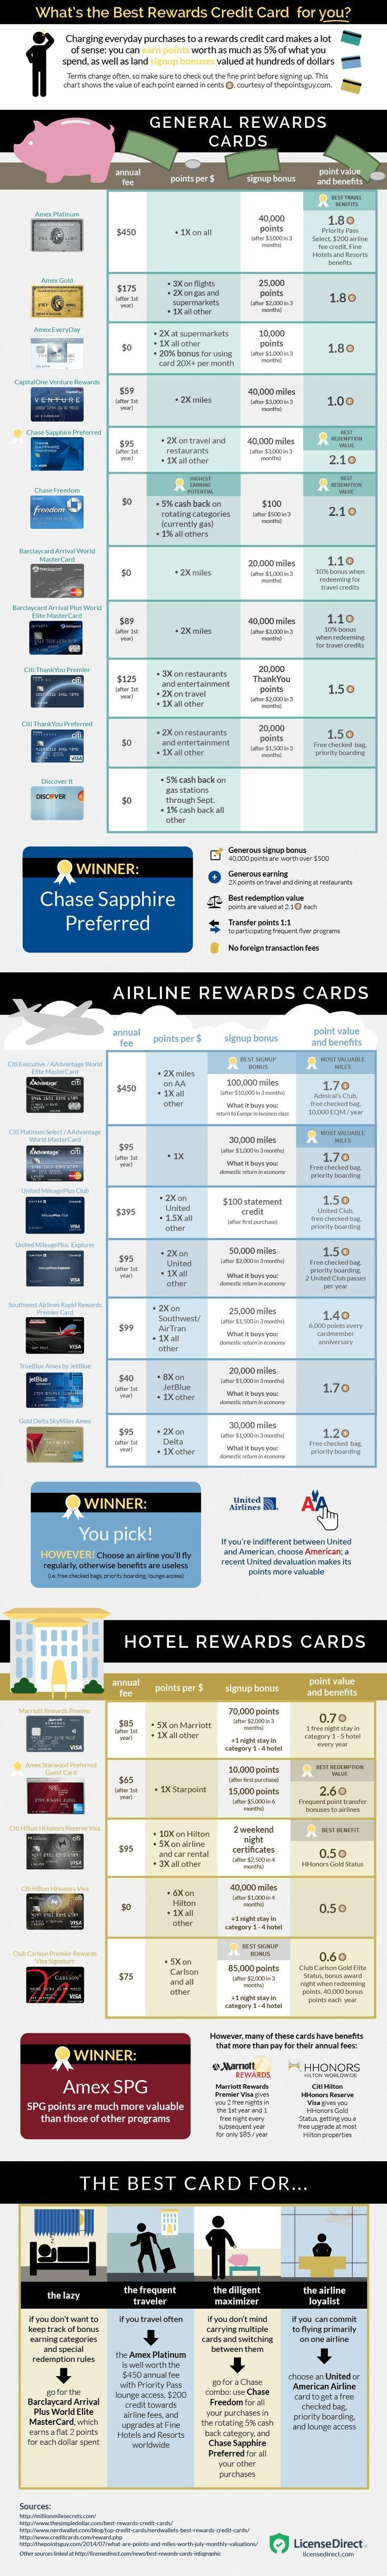 Credit Card Debt Interest Calculator Credit Card Debt Interest Calculator